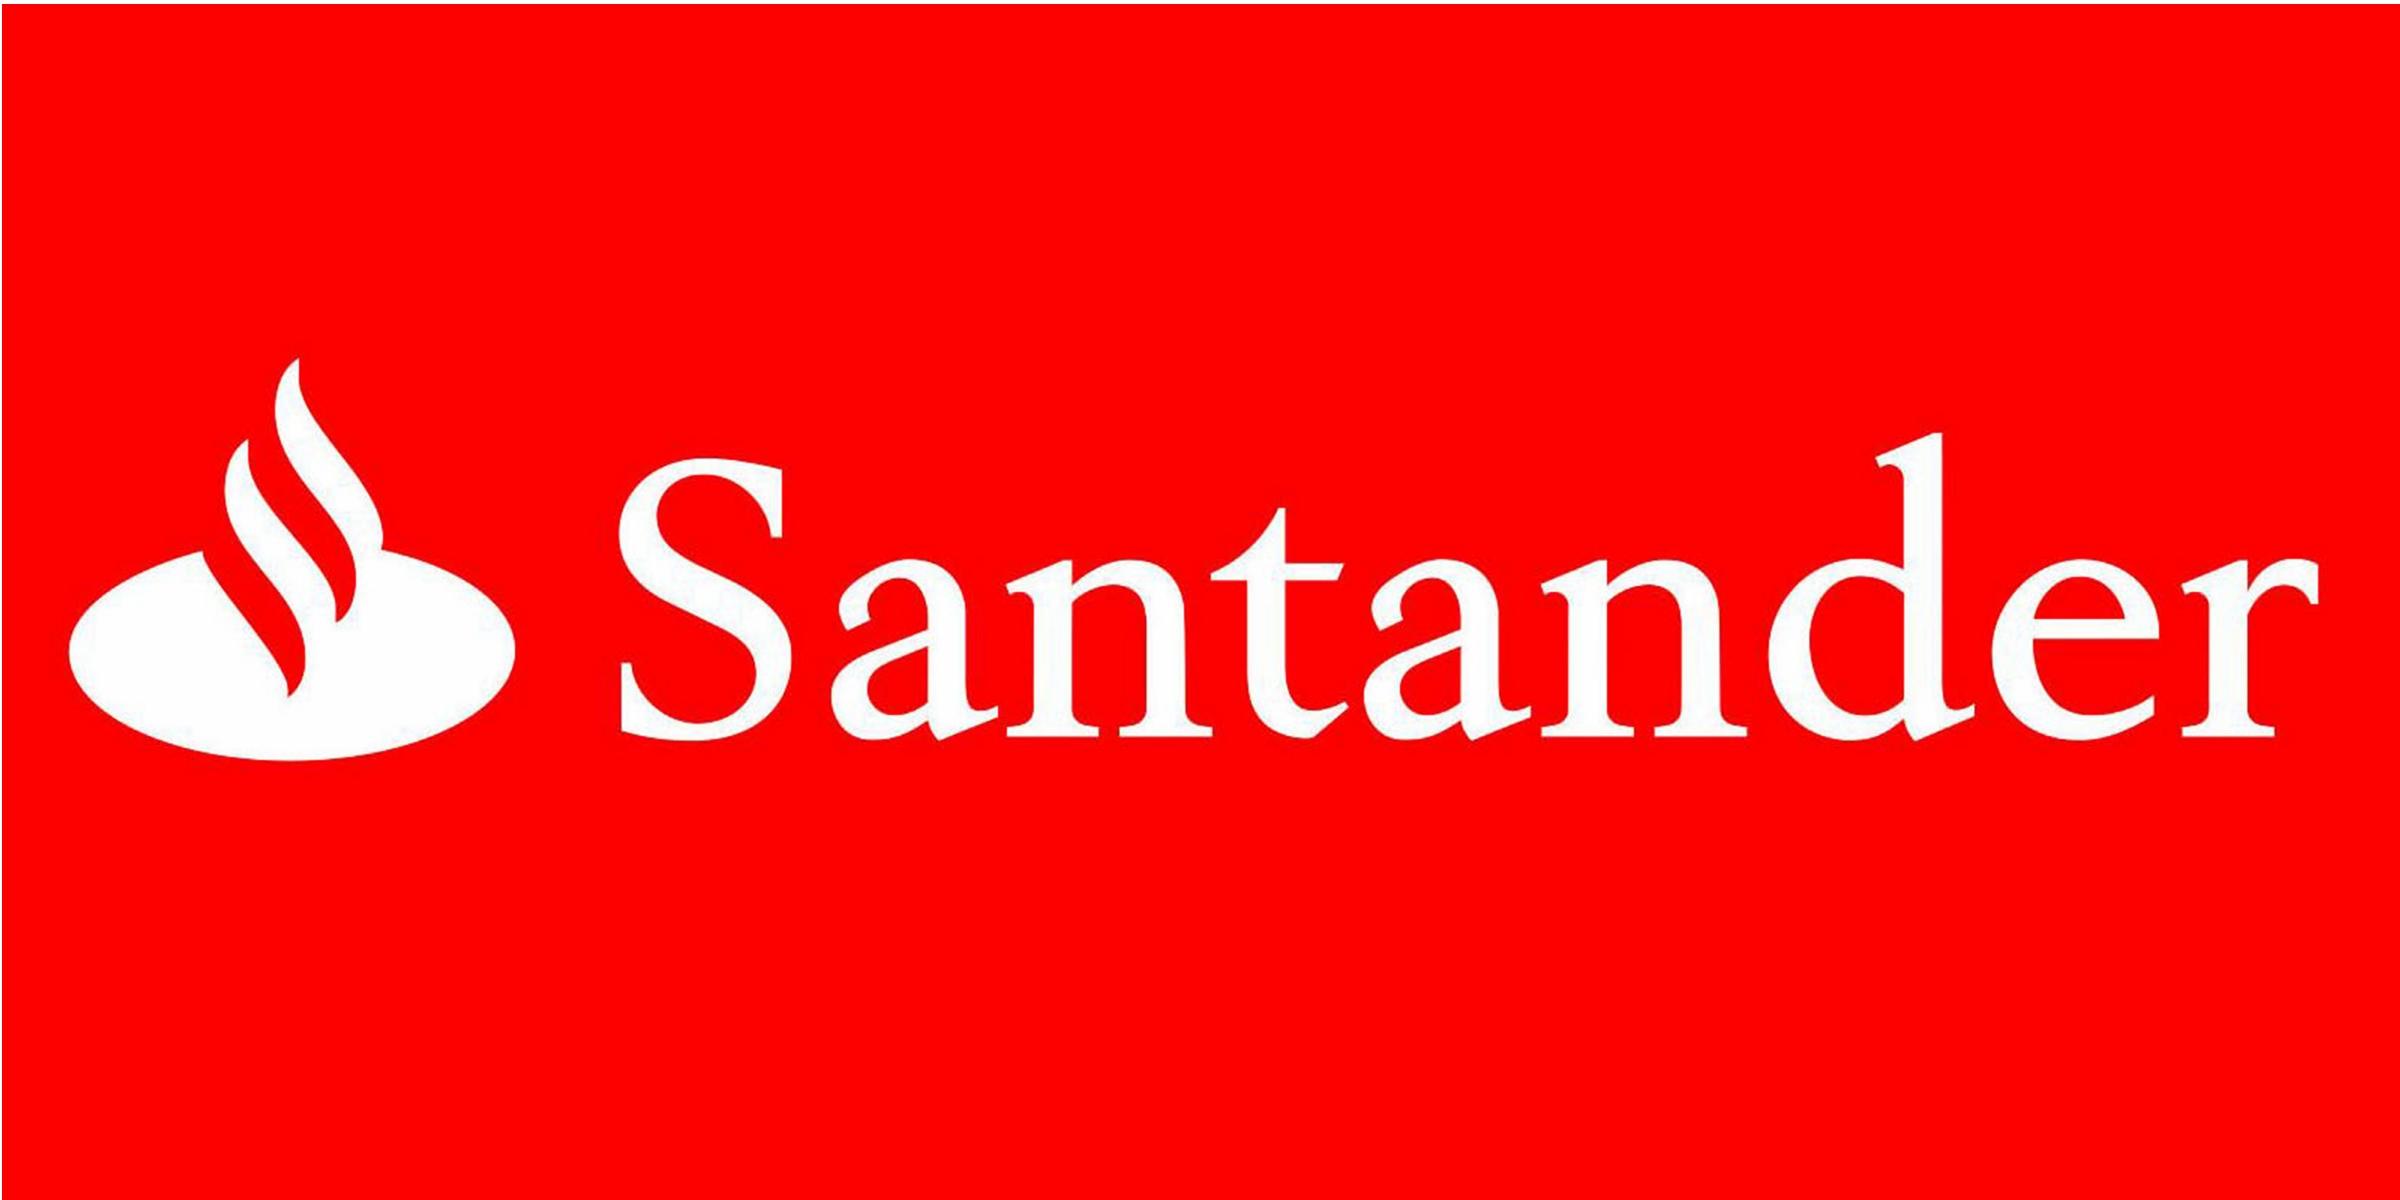 santander internet banking contact number